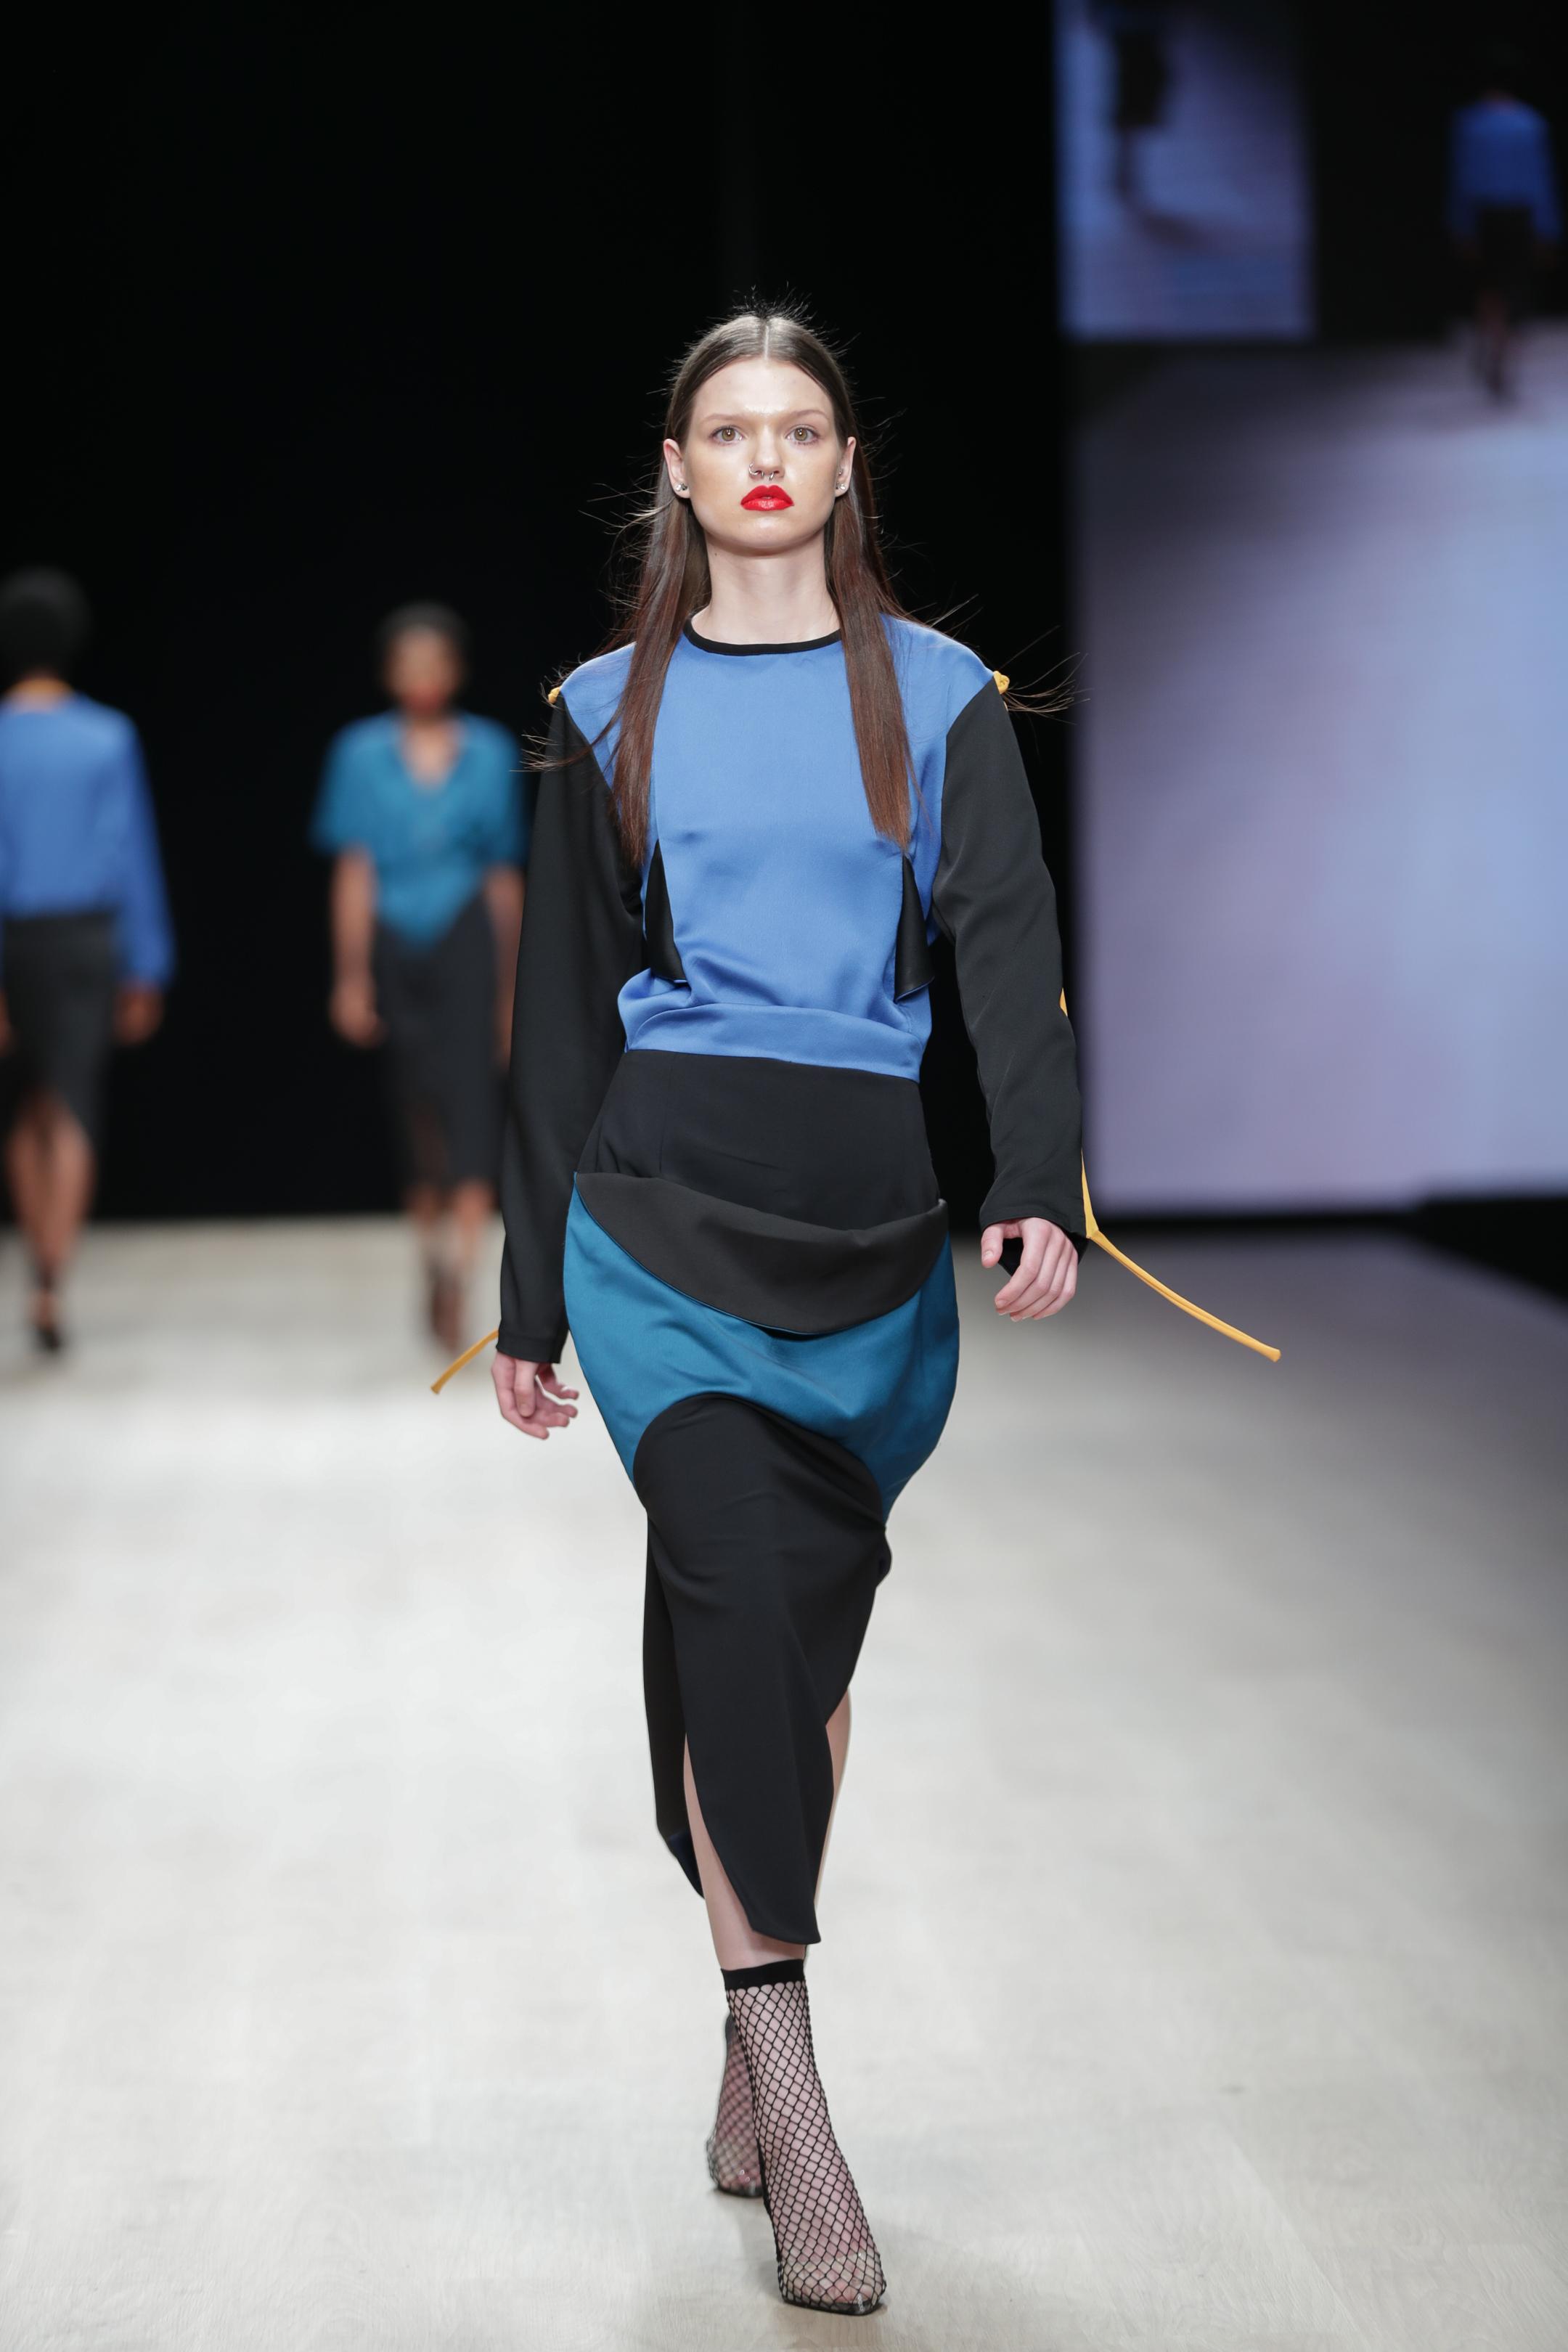 ARISE Fashion Week 2019 – Runway Day 2: Gozel Green